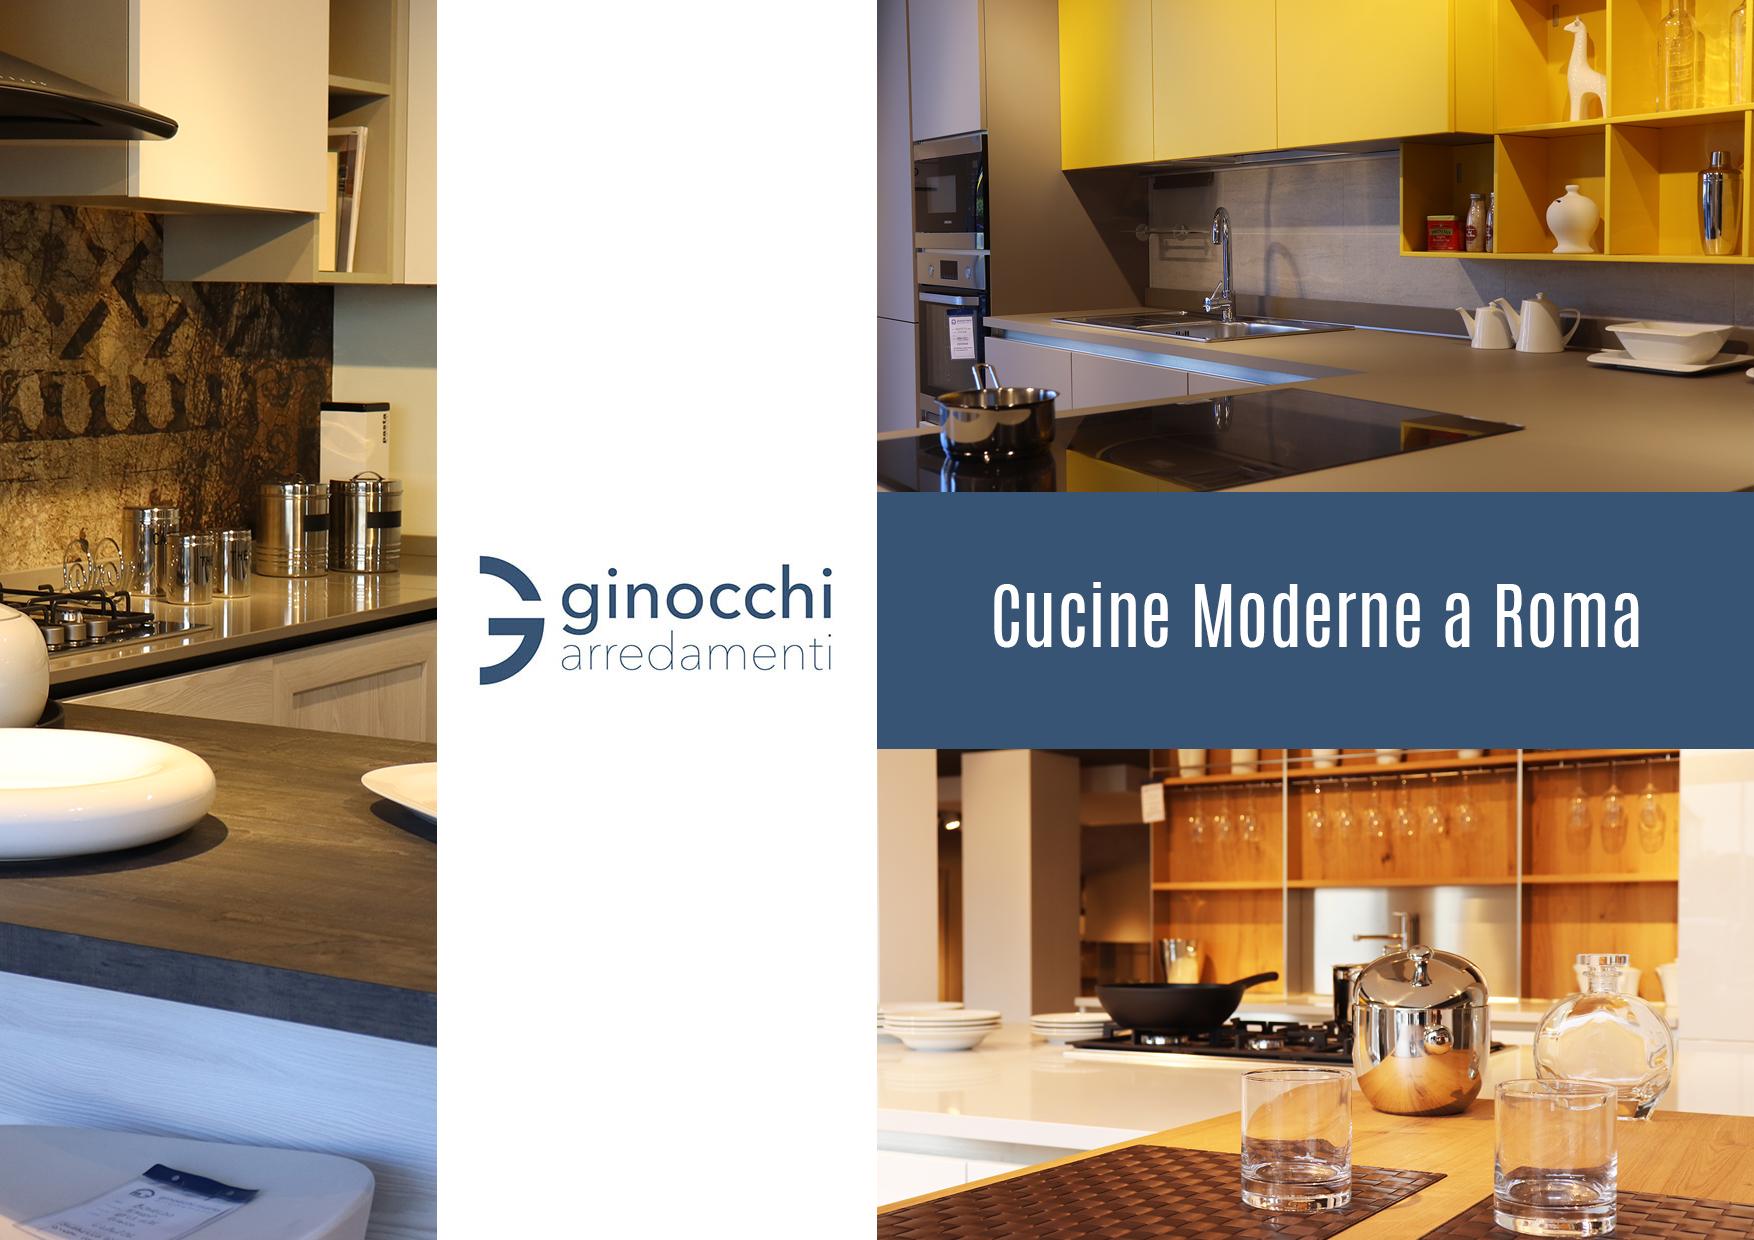 Cucine moderne roma ginocchi arredamenti for Ginocchi arredamenti roma